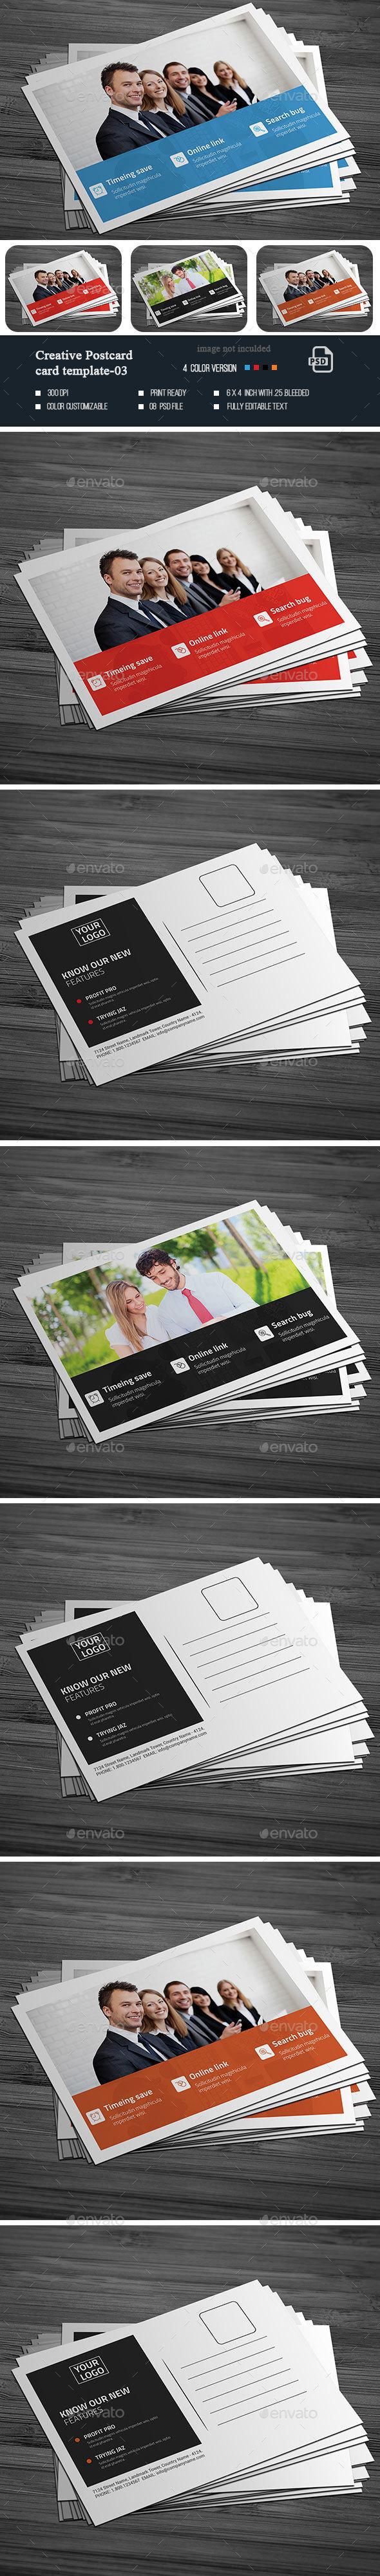 Creative Post Card -03 - Cards & Invites Print Templates